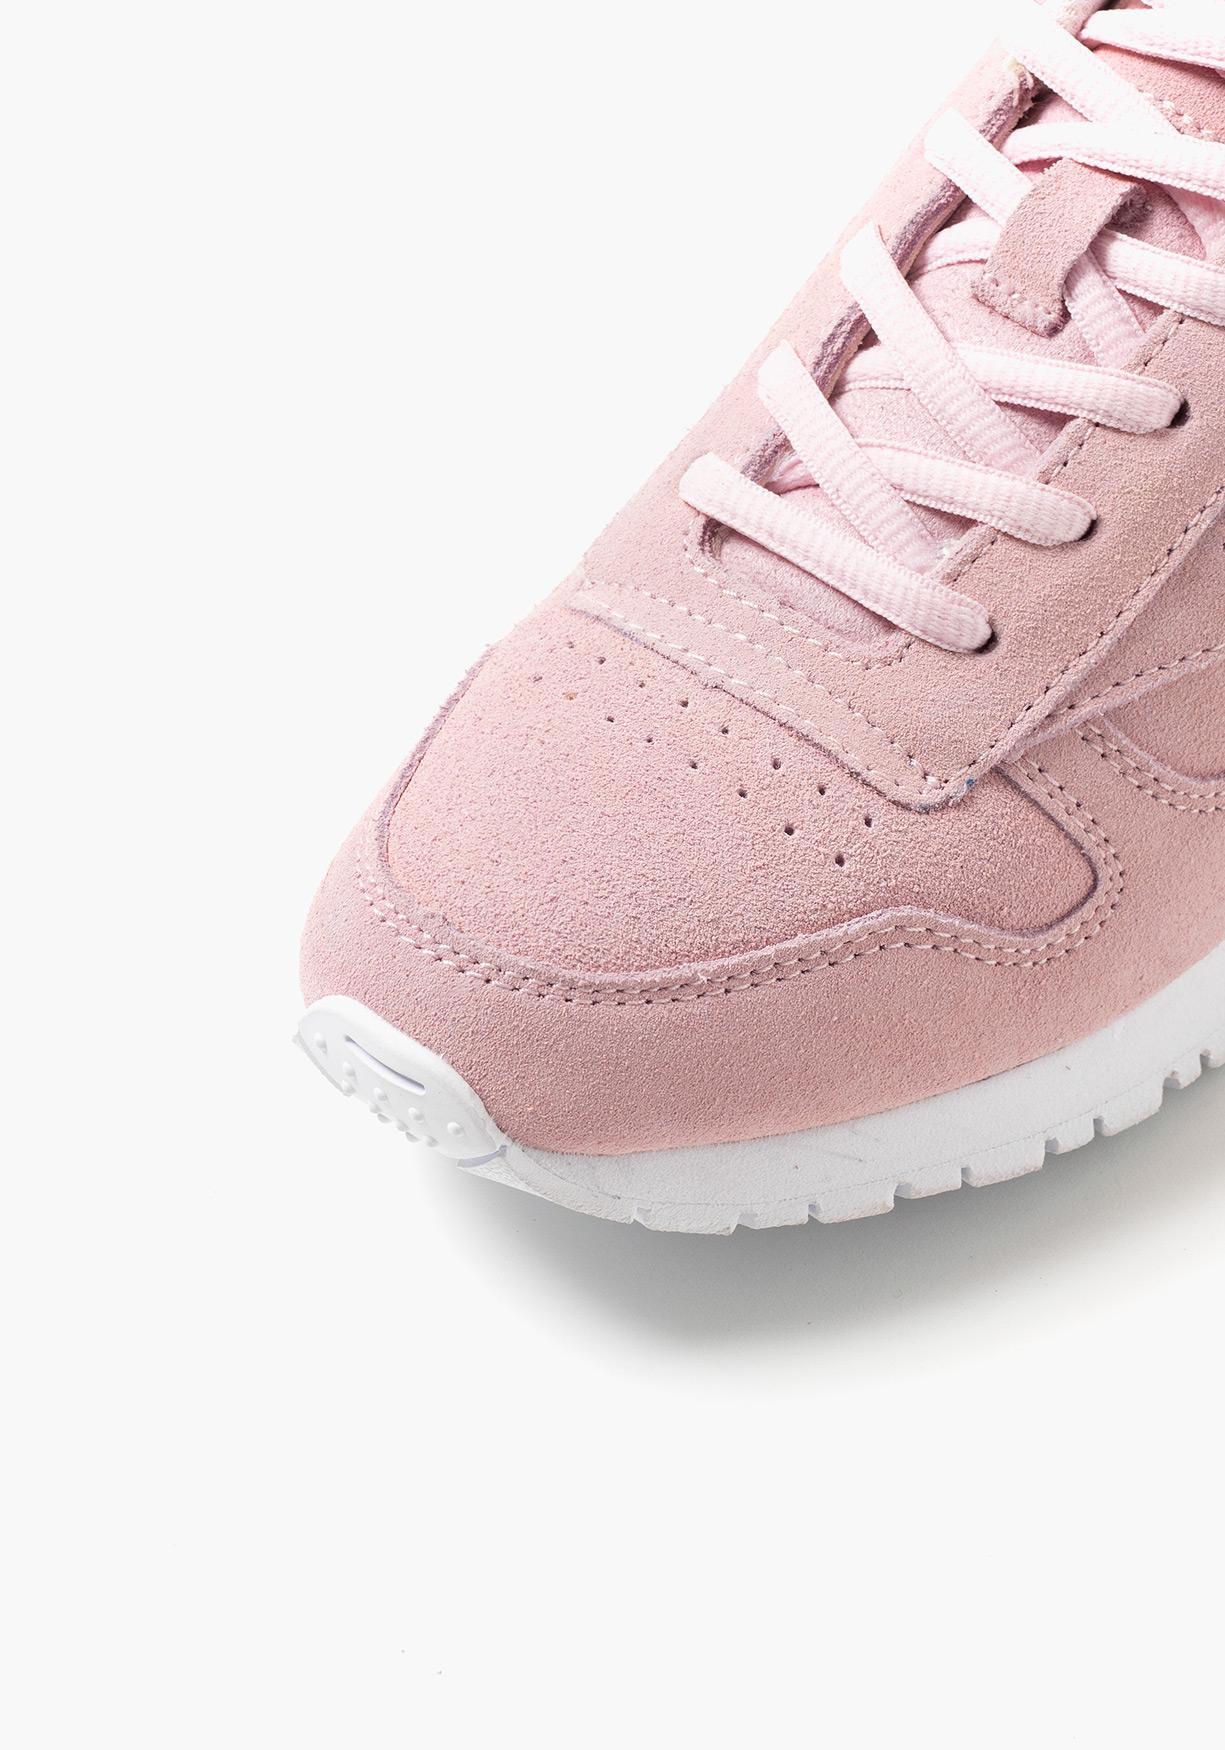 fa38b6e9658 Comprar Zapatillas deportivas de piel KELME. ¡Aprovéchate de ...